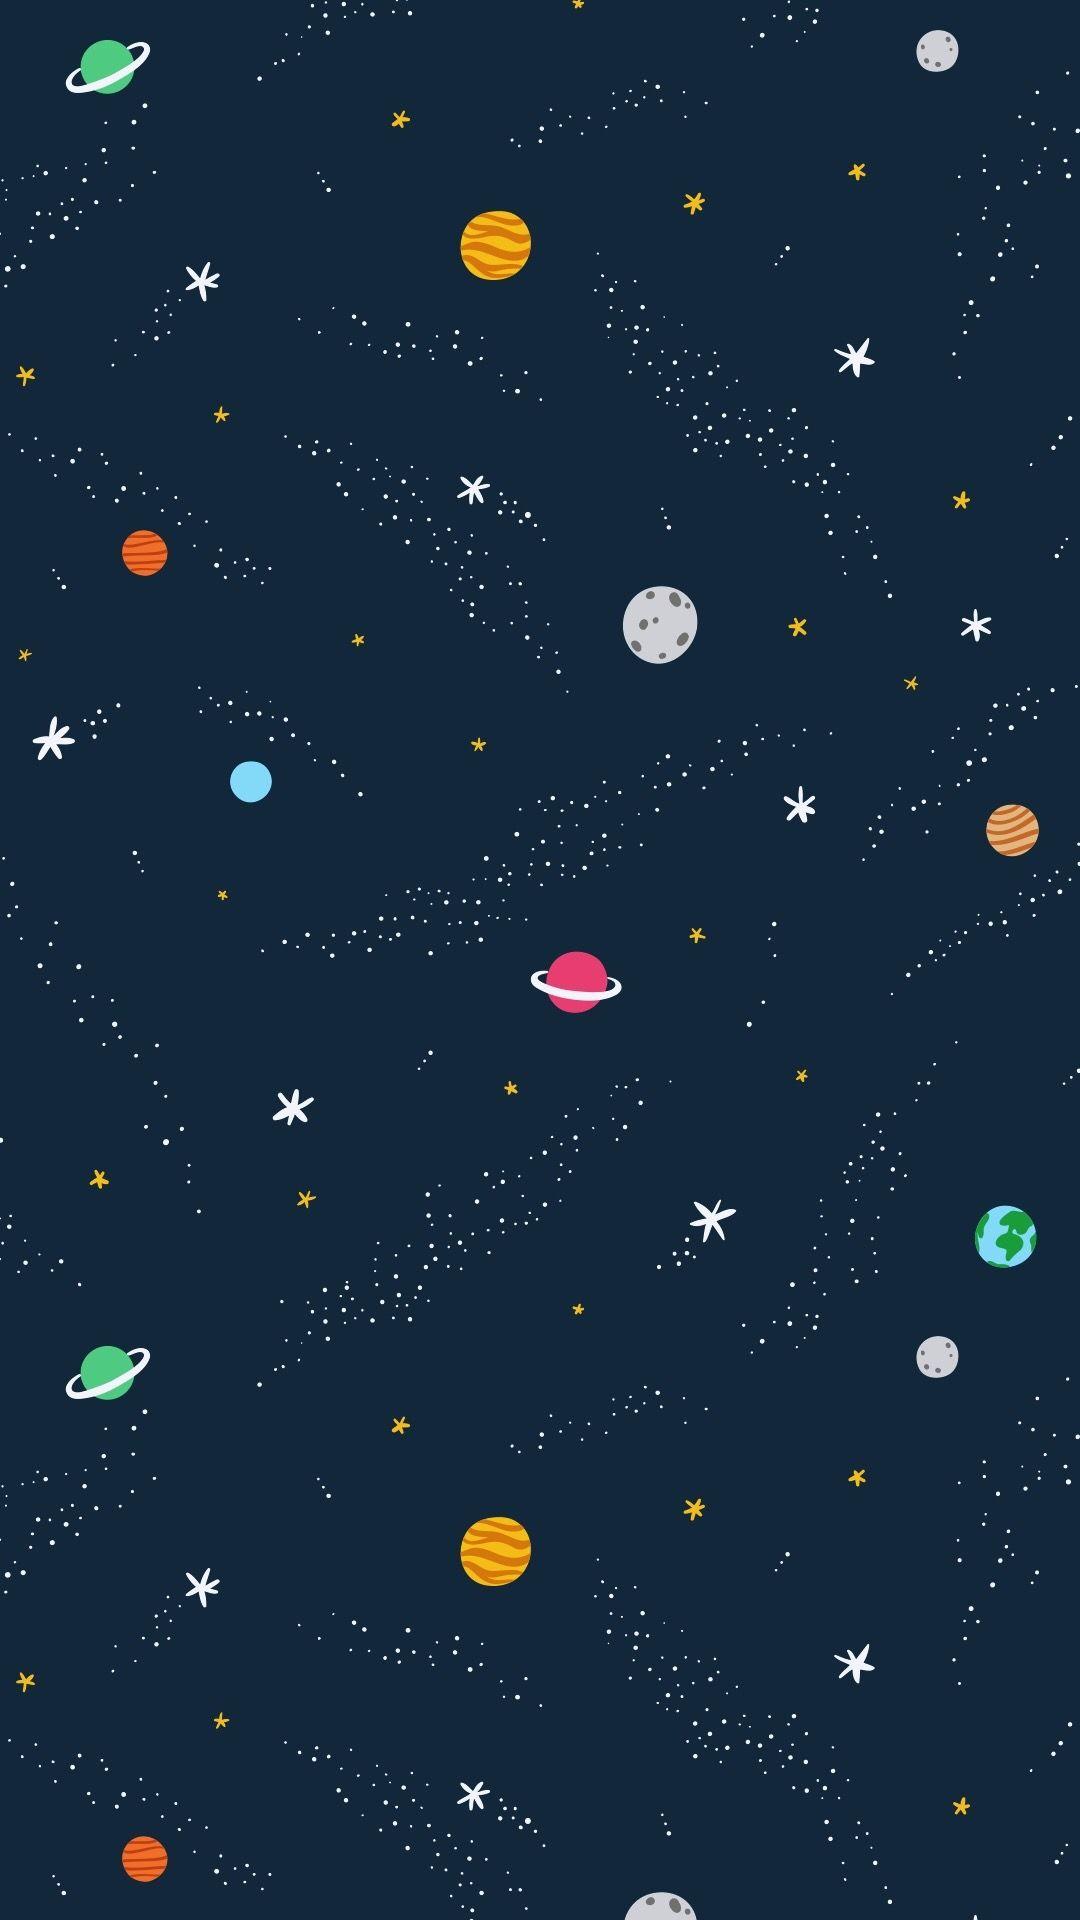 Fondos del espacio y el universo para celular android e for Fondos celular android